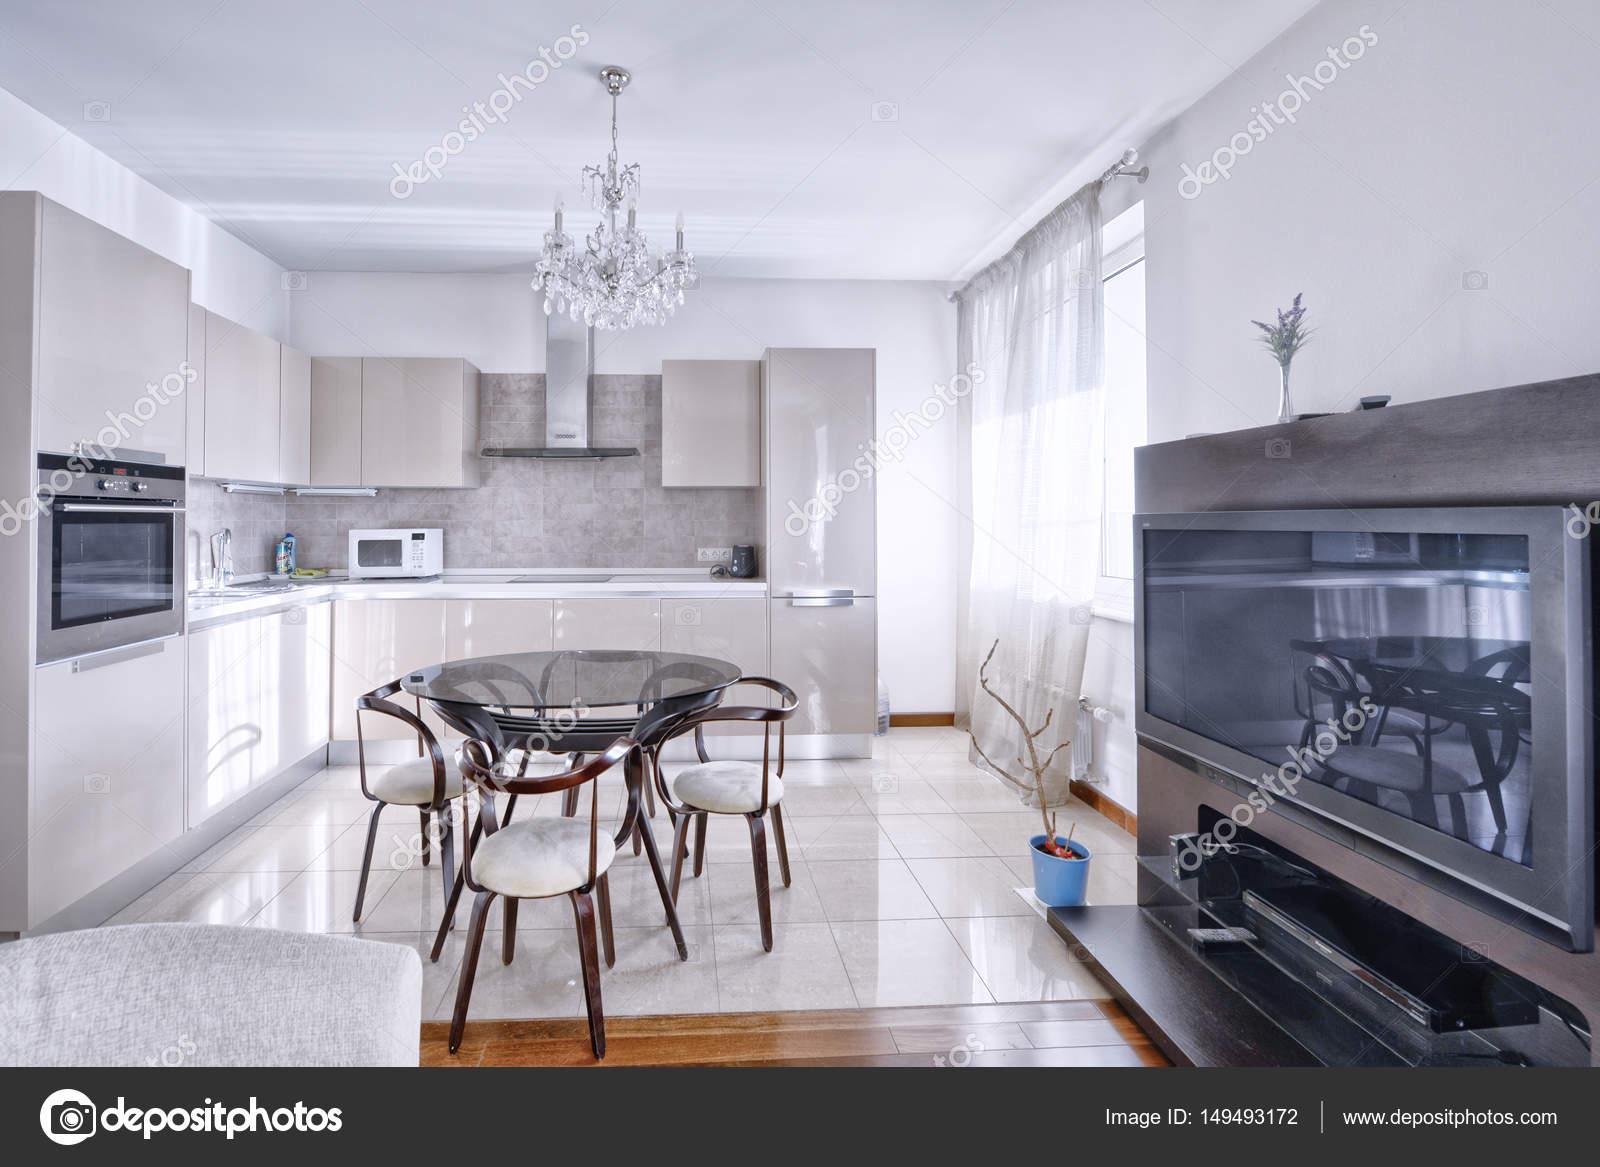 Afbeeldingen Design Keukens : Interieur design keuken woonkamer u2014 stockfoto © ovchinnikovfoto